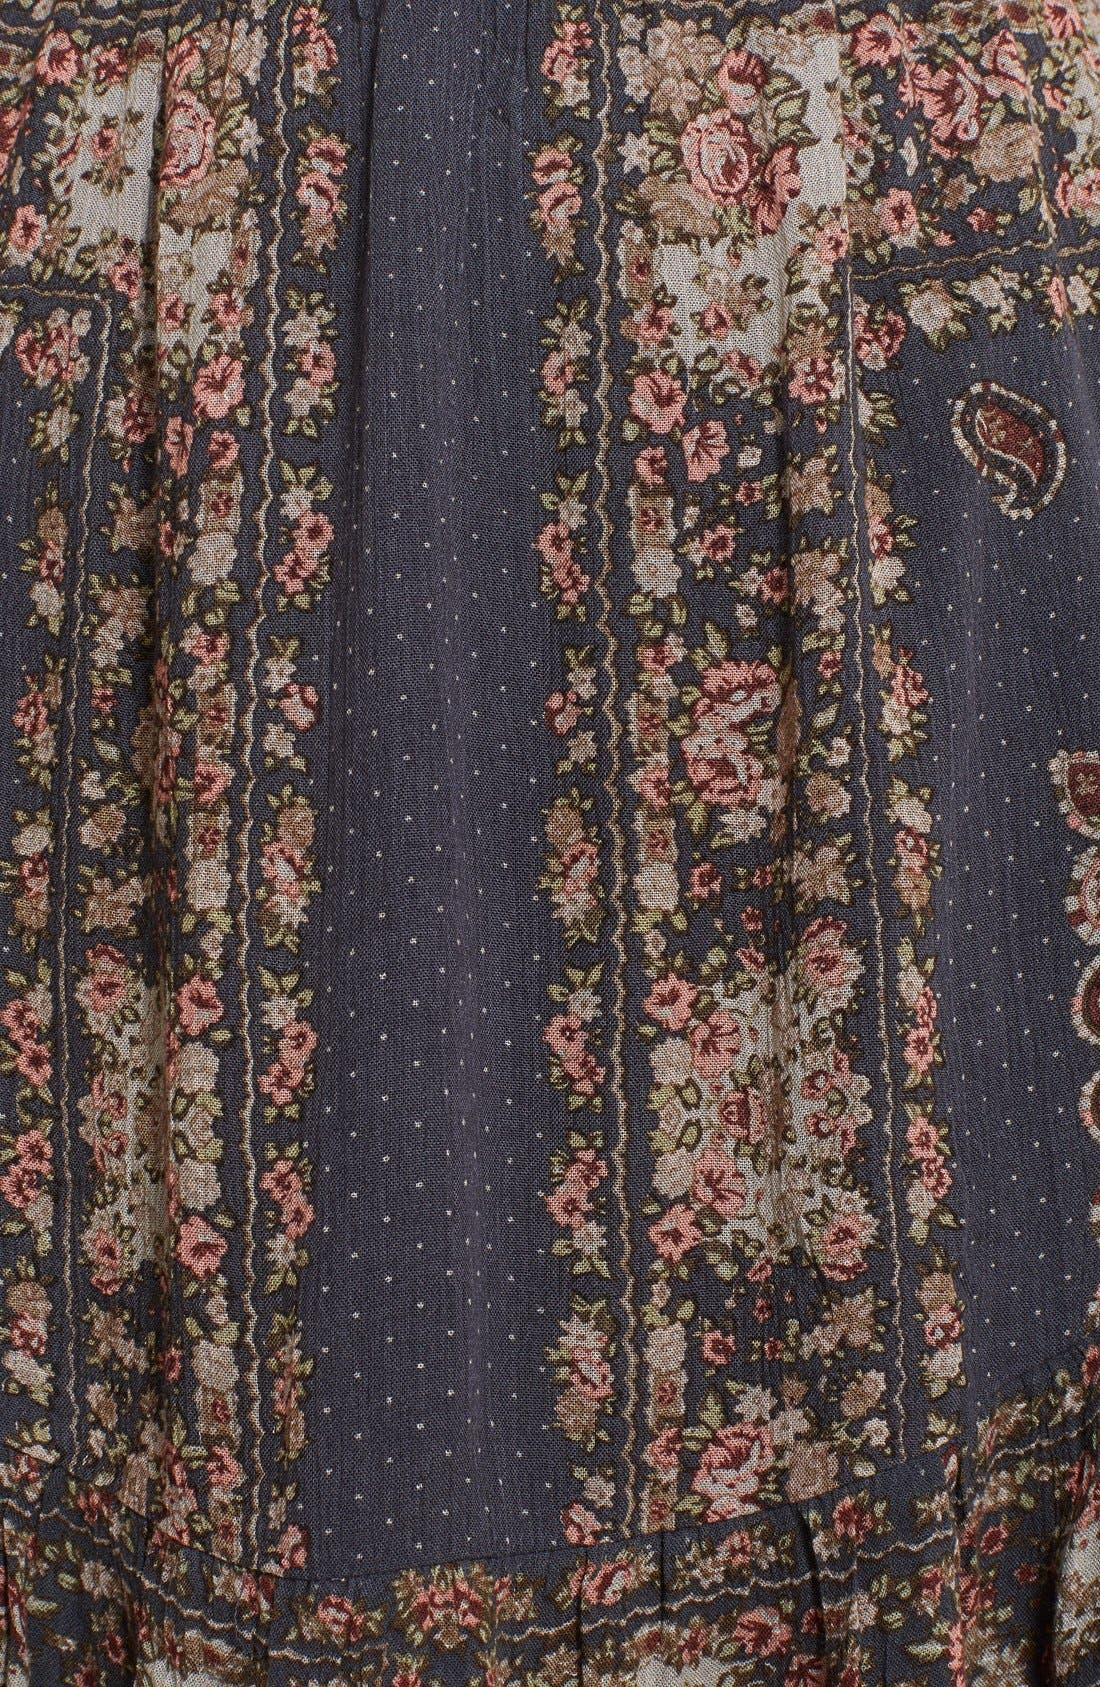 'Bridgette' Print Ruffle Hem Dress,                             Alternate thumbnail 4, color,                             001